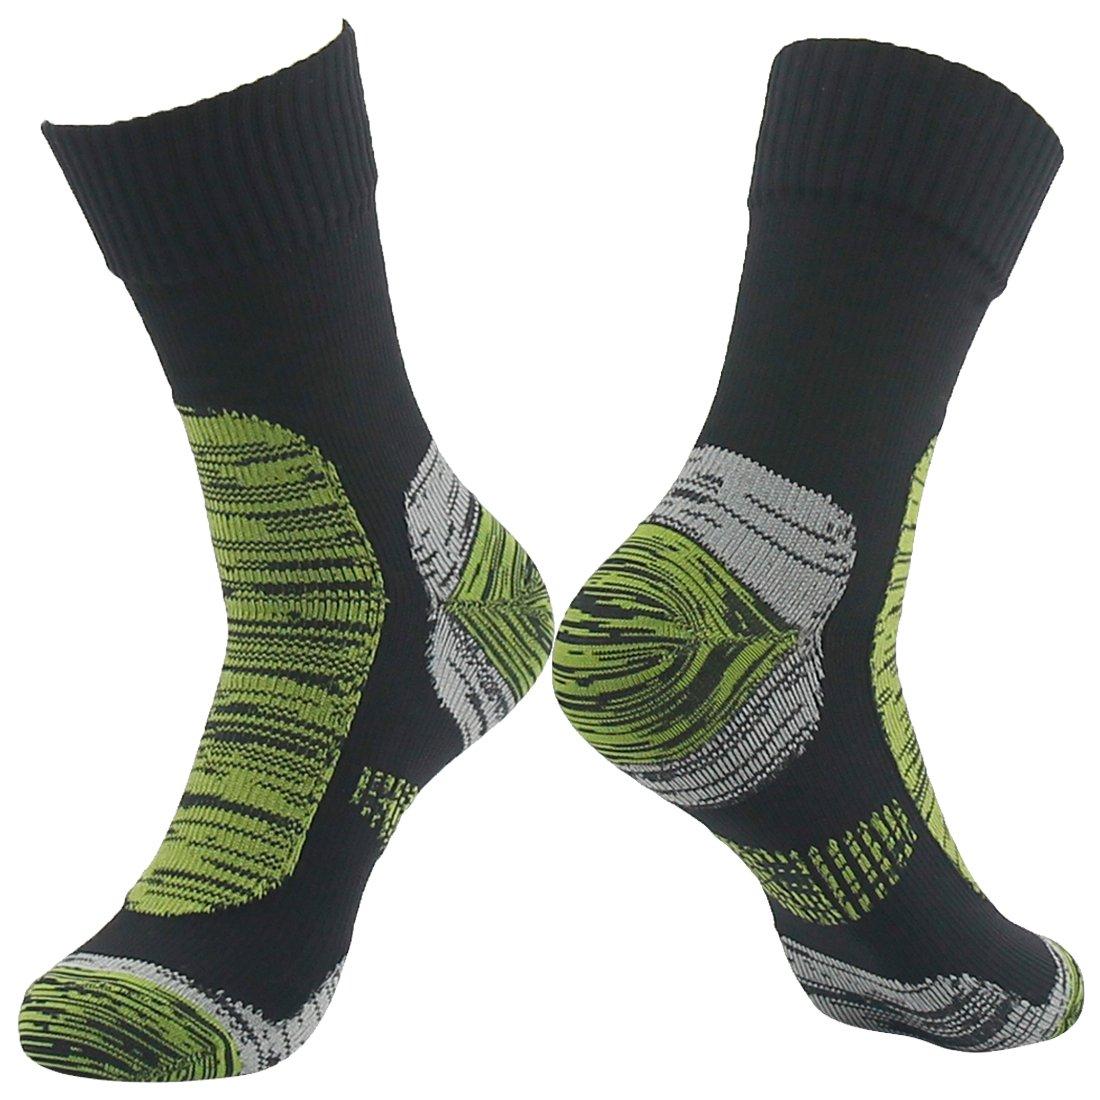 RANDY SUN Men's Comfortable Warm and Dry Crew Waterproof Socks Black&Grass Green Large